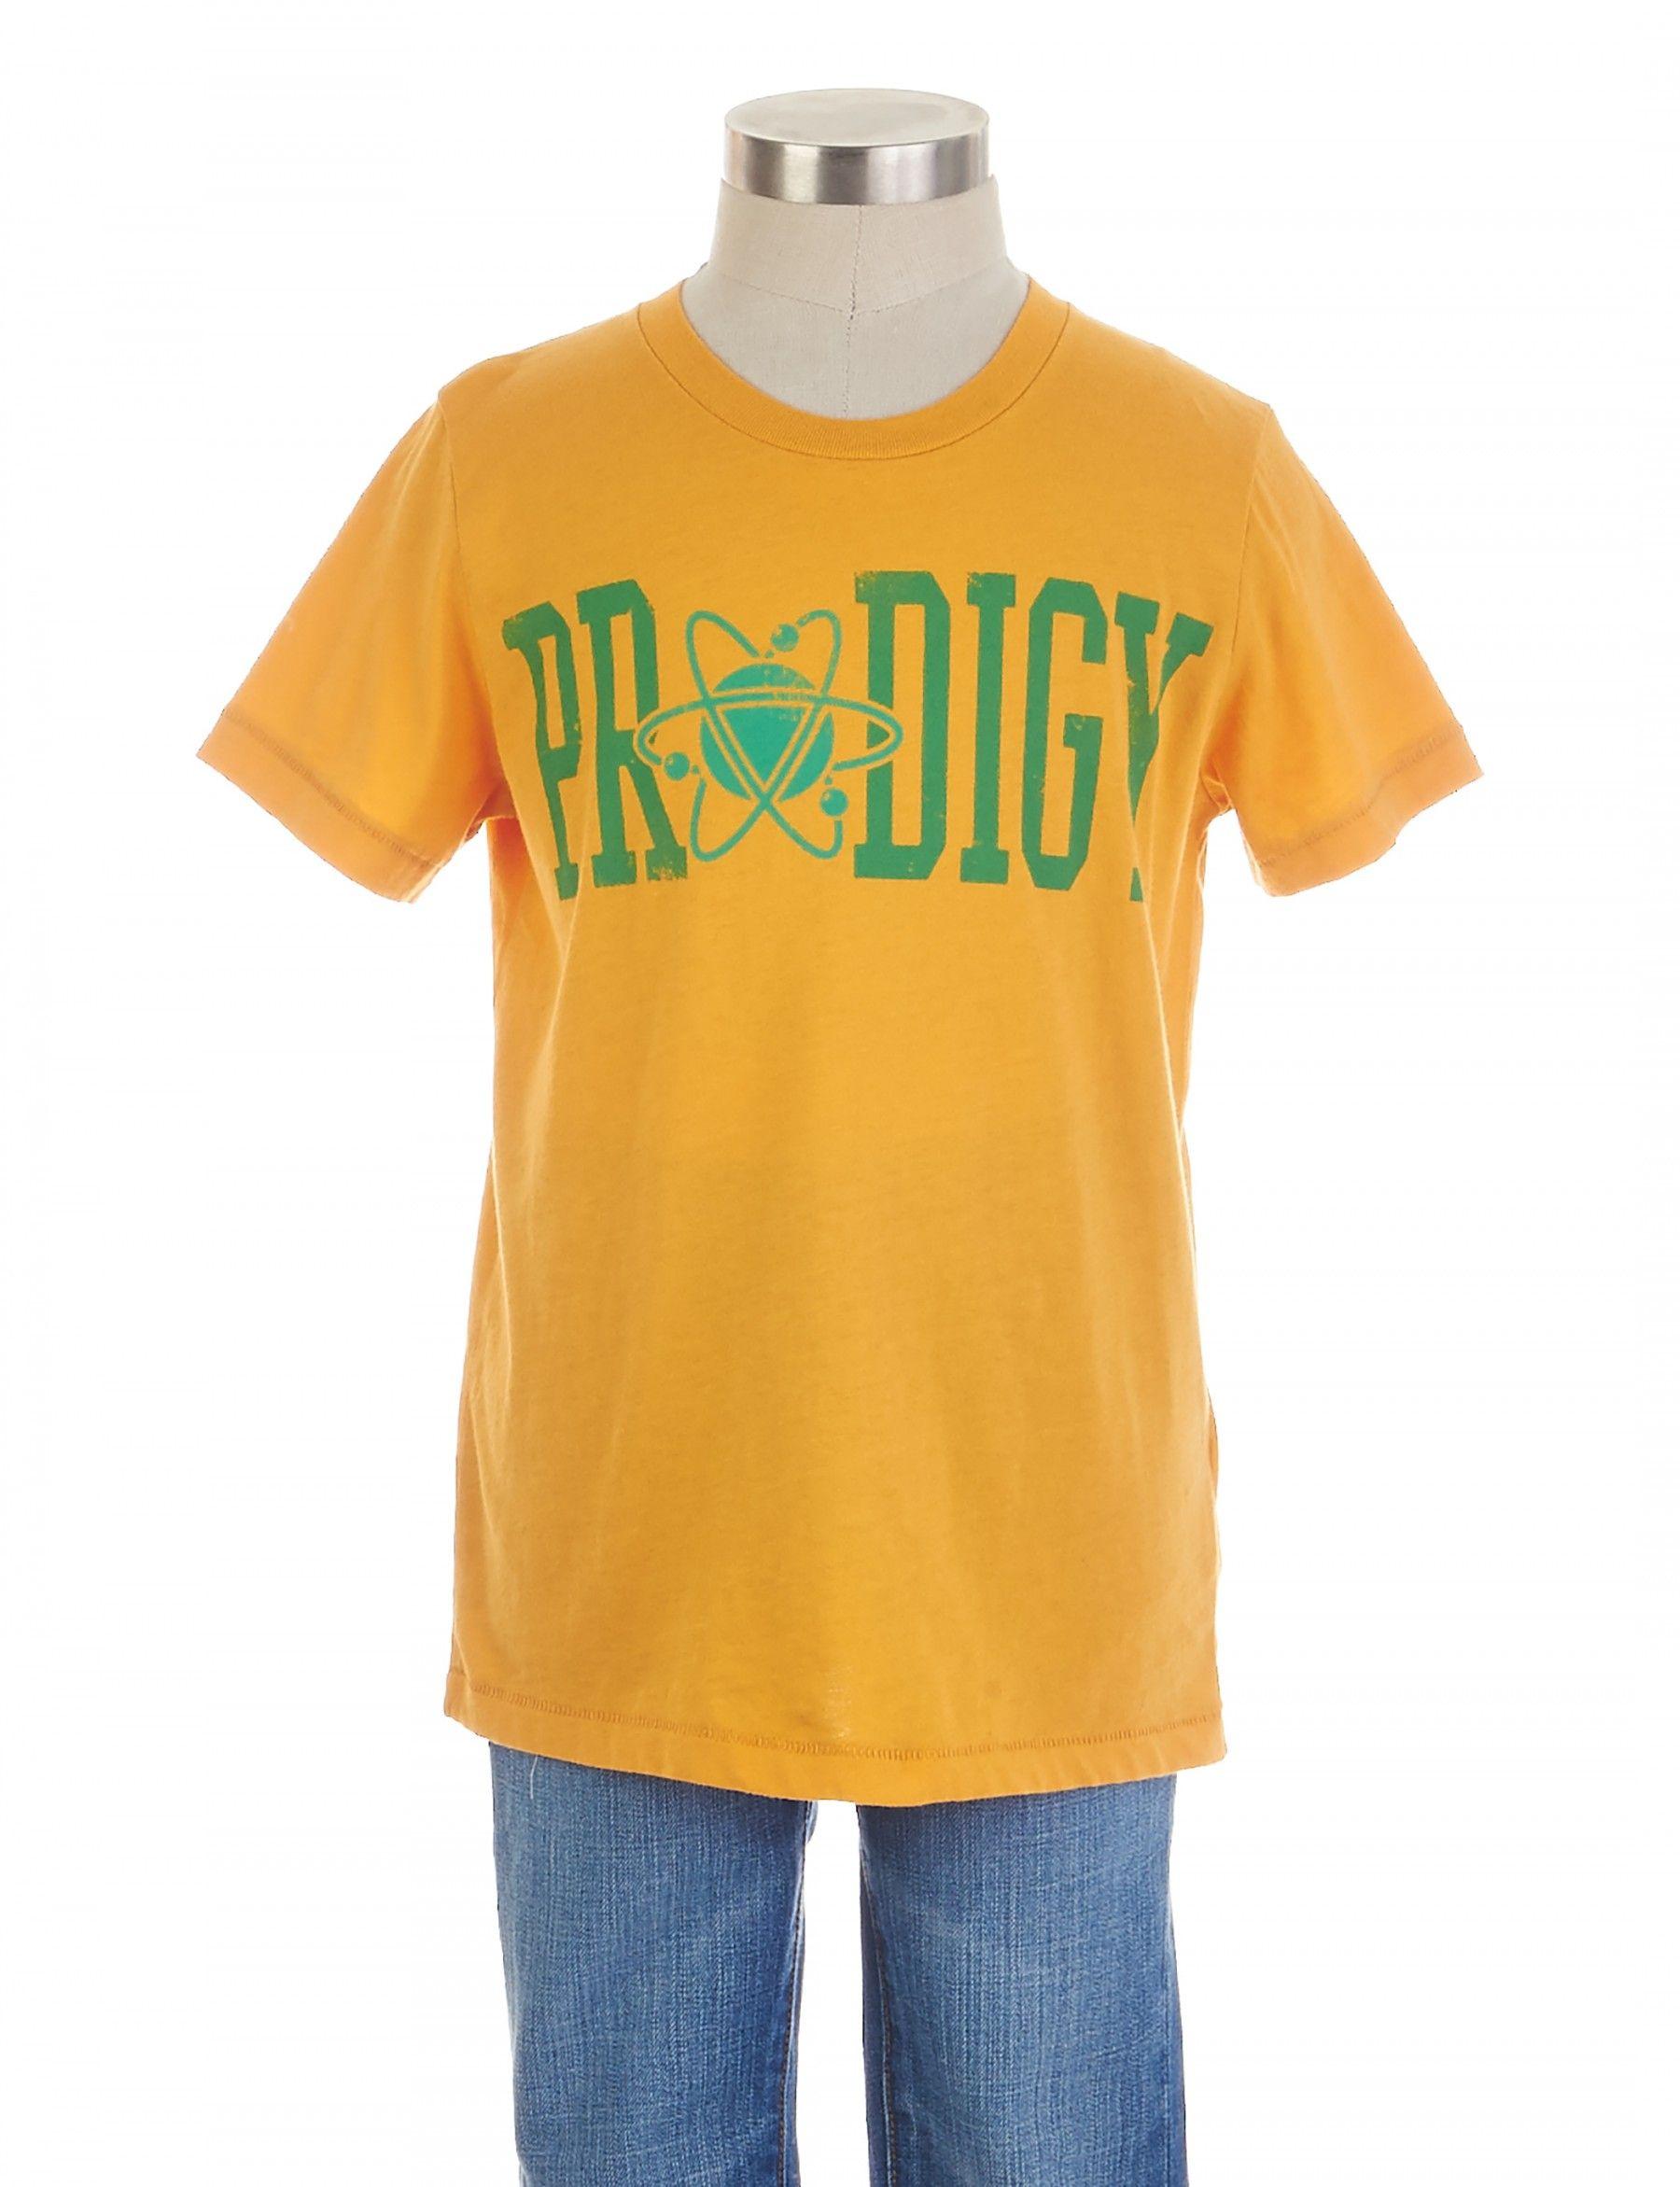 Prodigy Tee Shirts + Tees Categories boys Peek